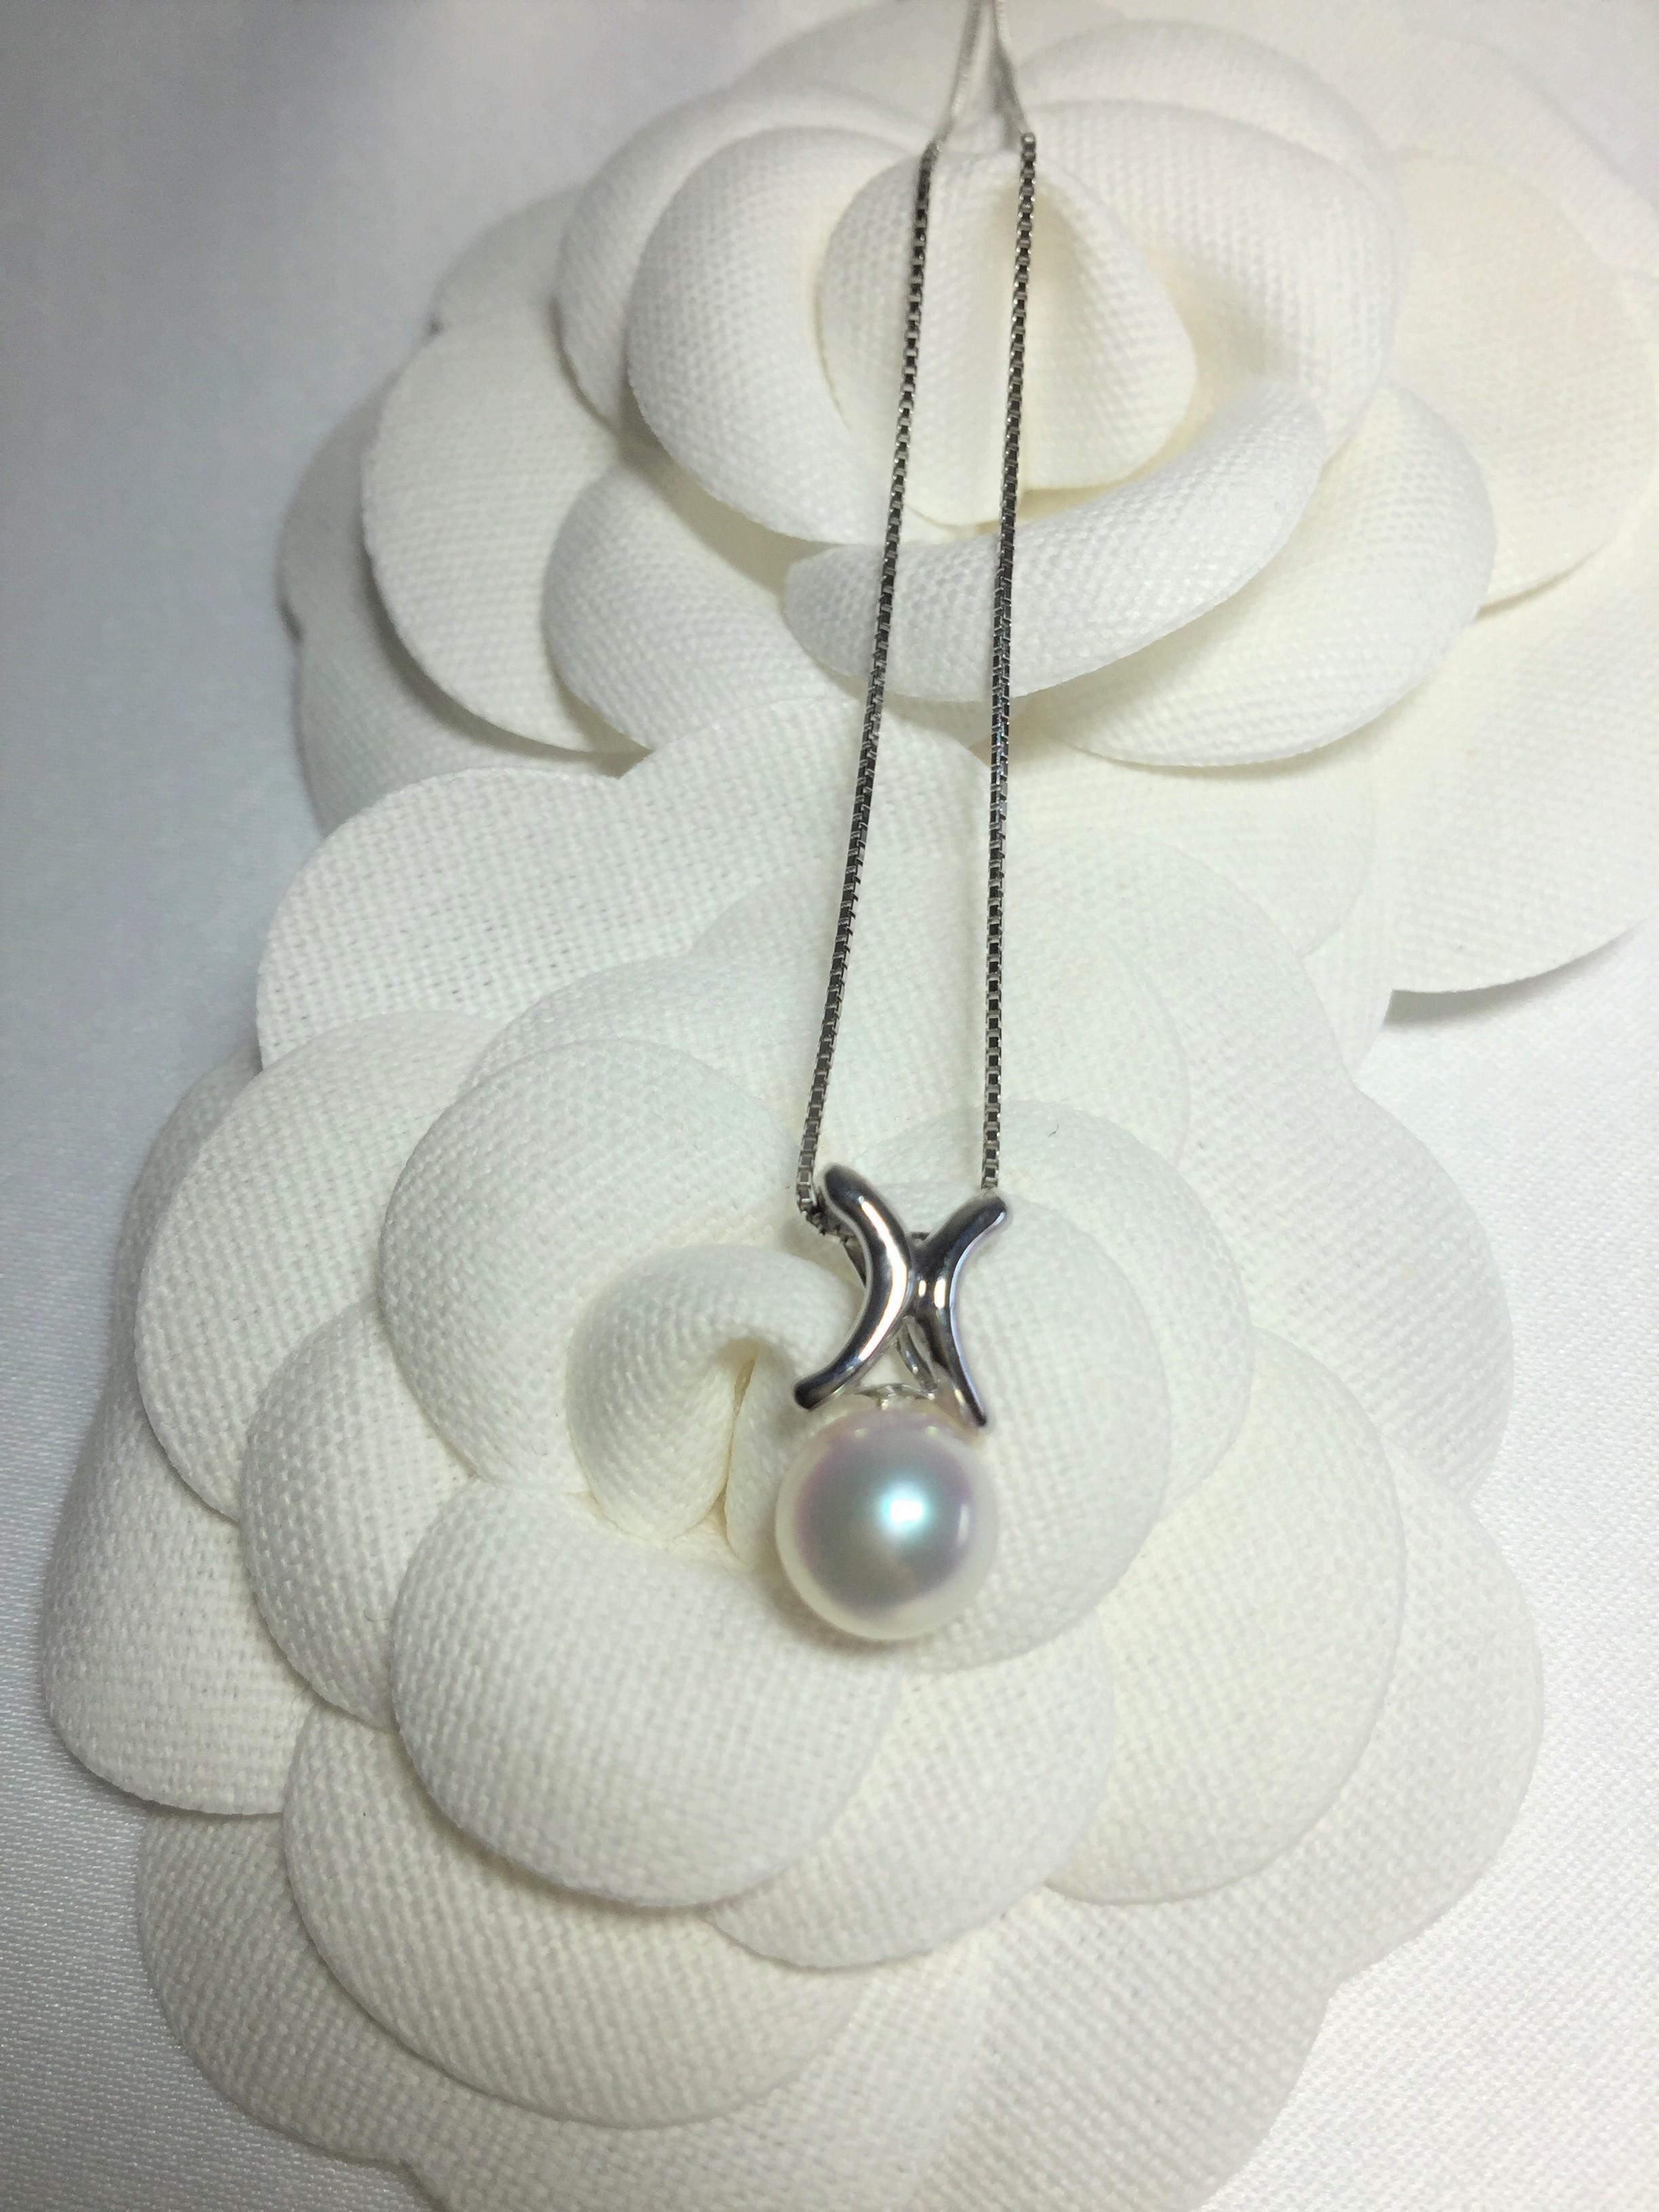 MIKIMOTO等級_日本AKOYA海水珍珠白18K金X型項鍊_日本大正時代創立「清太屋」